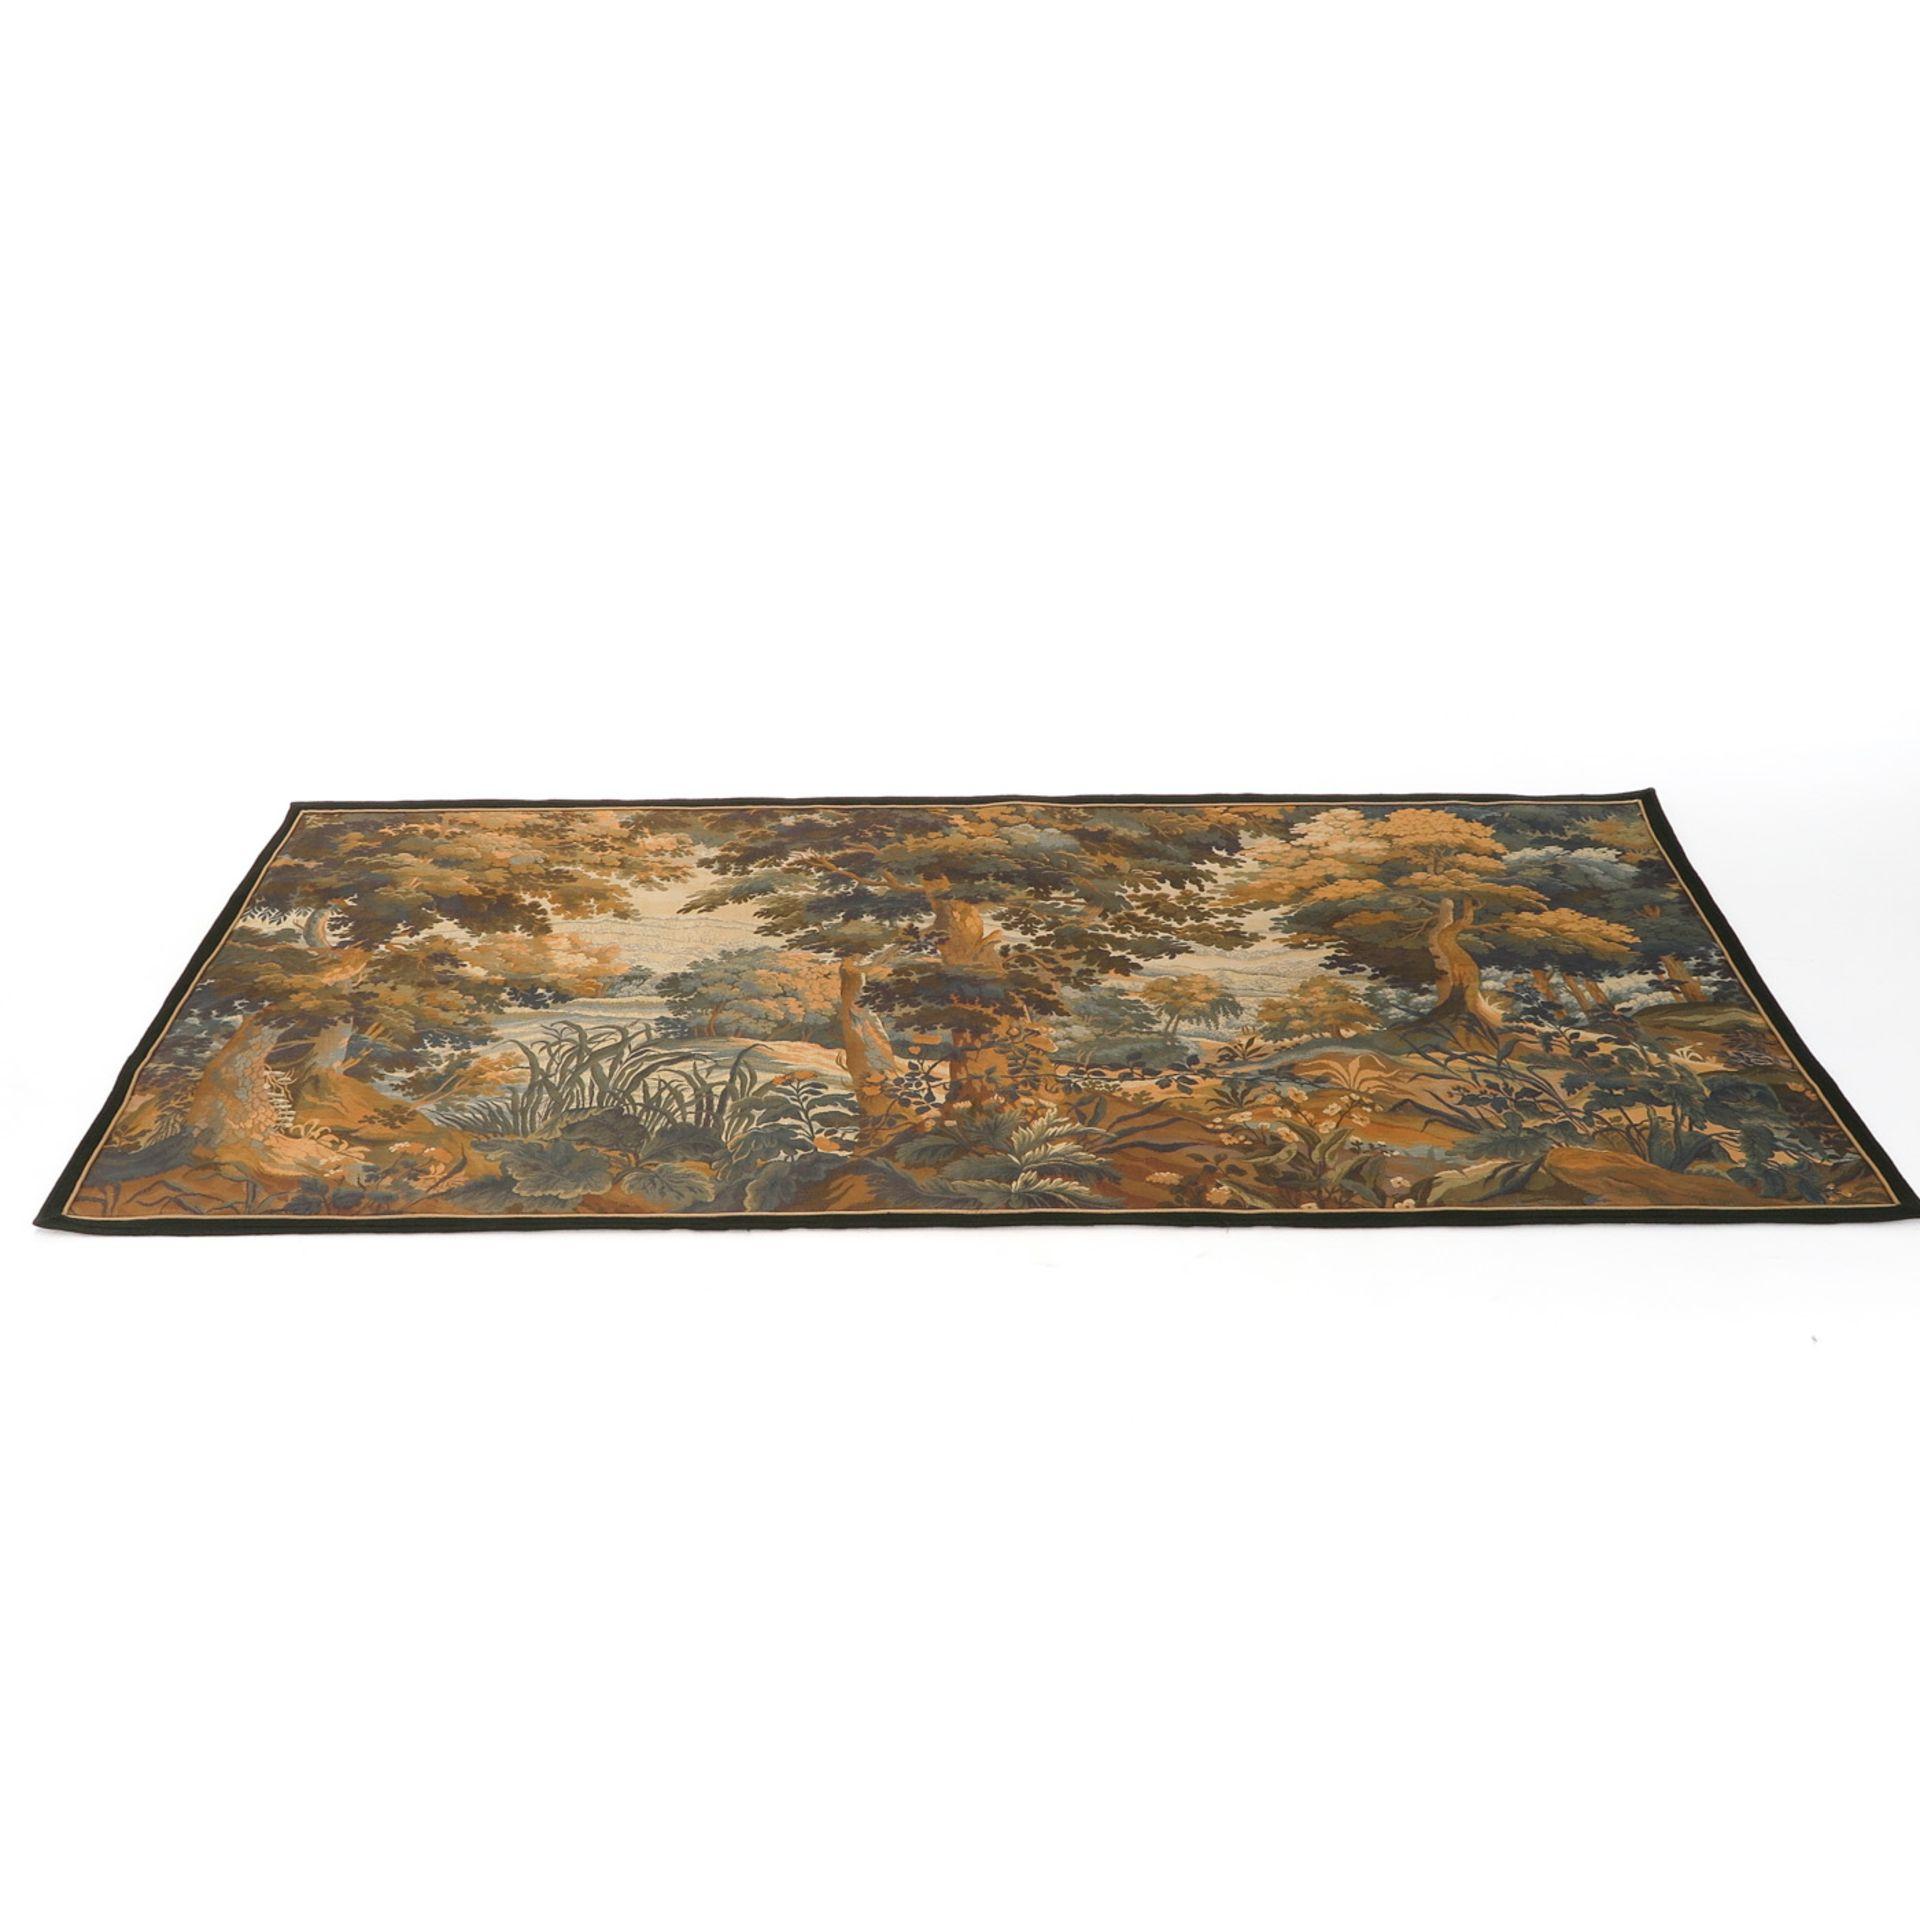 Los 1090 - A Landscape Decor Tapestry